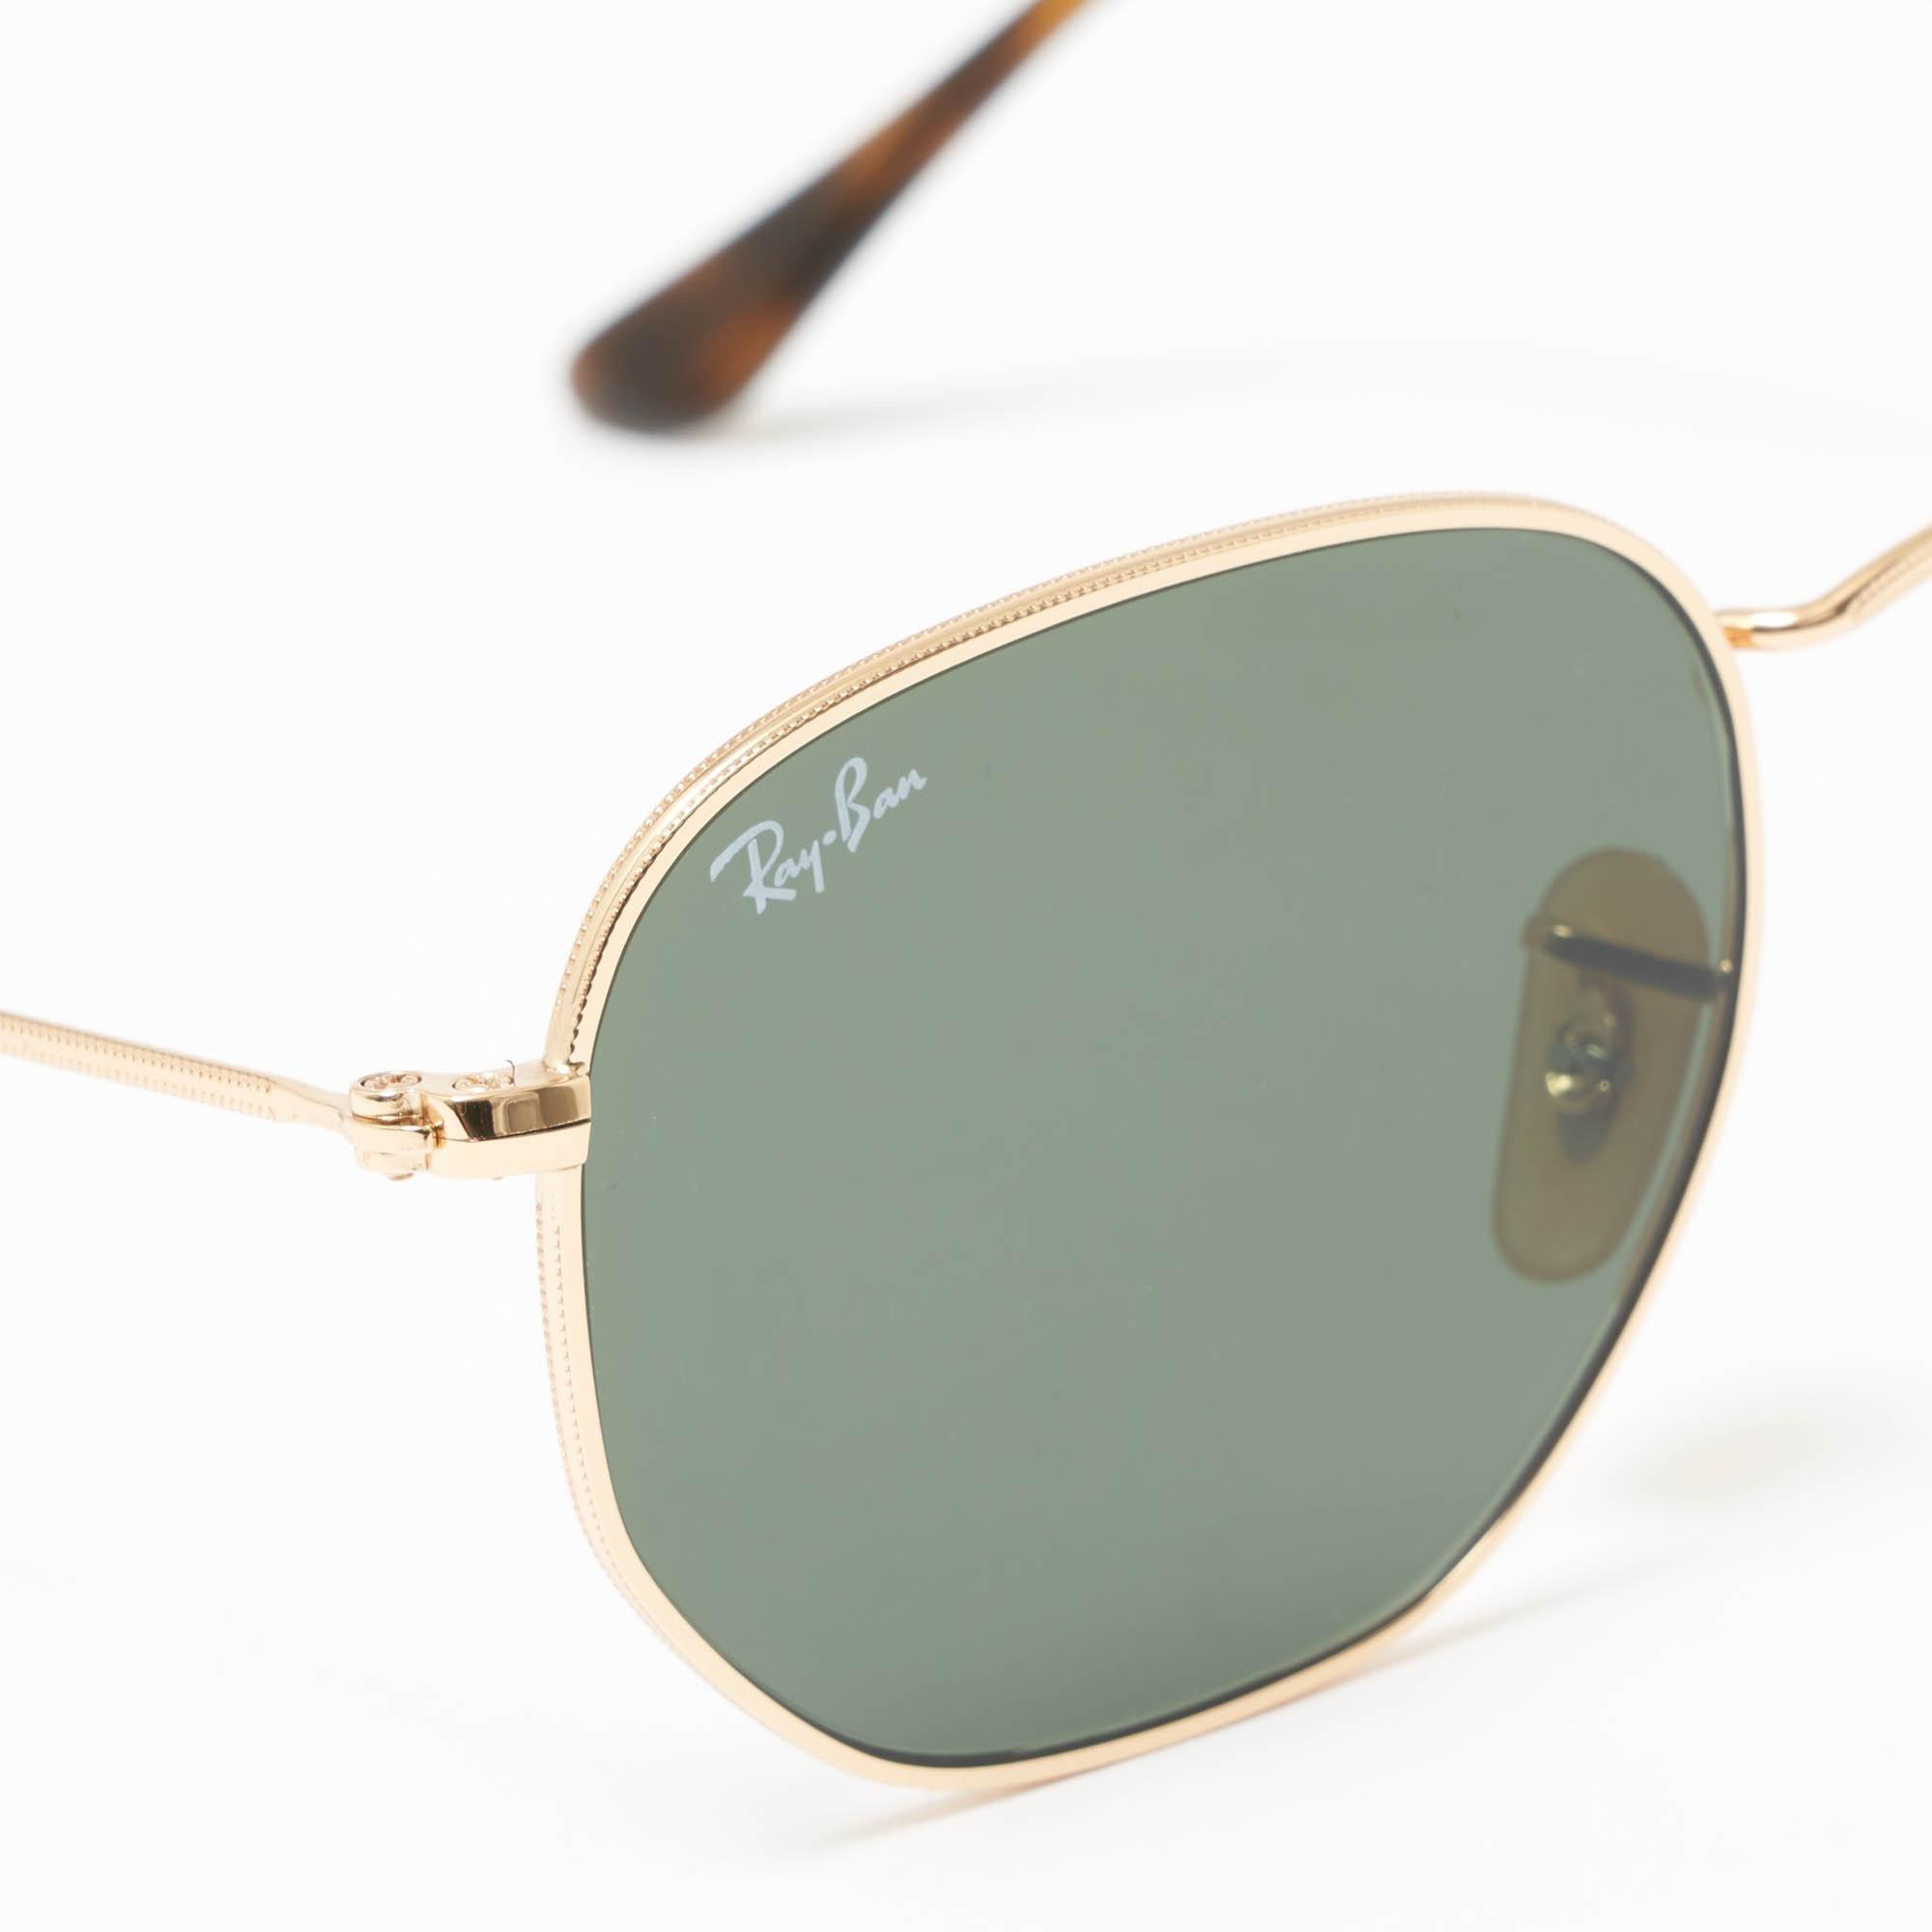 7981c24008f94 Ray-Ban - Metallic Gold Hexagonal Flat Lens Sunglasses - Green Classic G-15.  View fullscreen